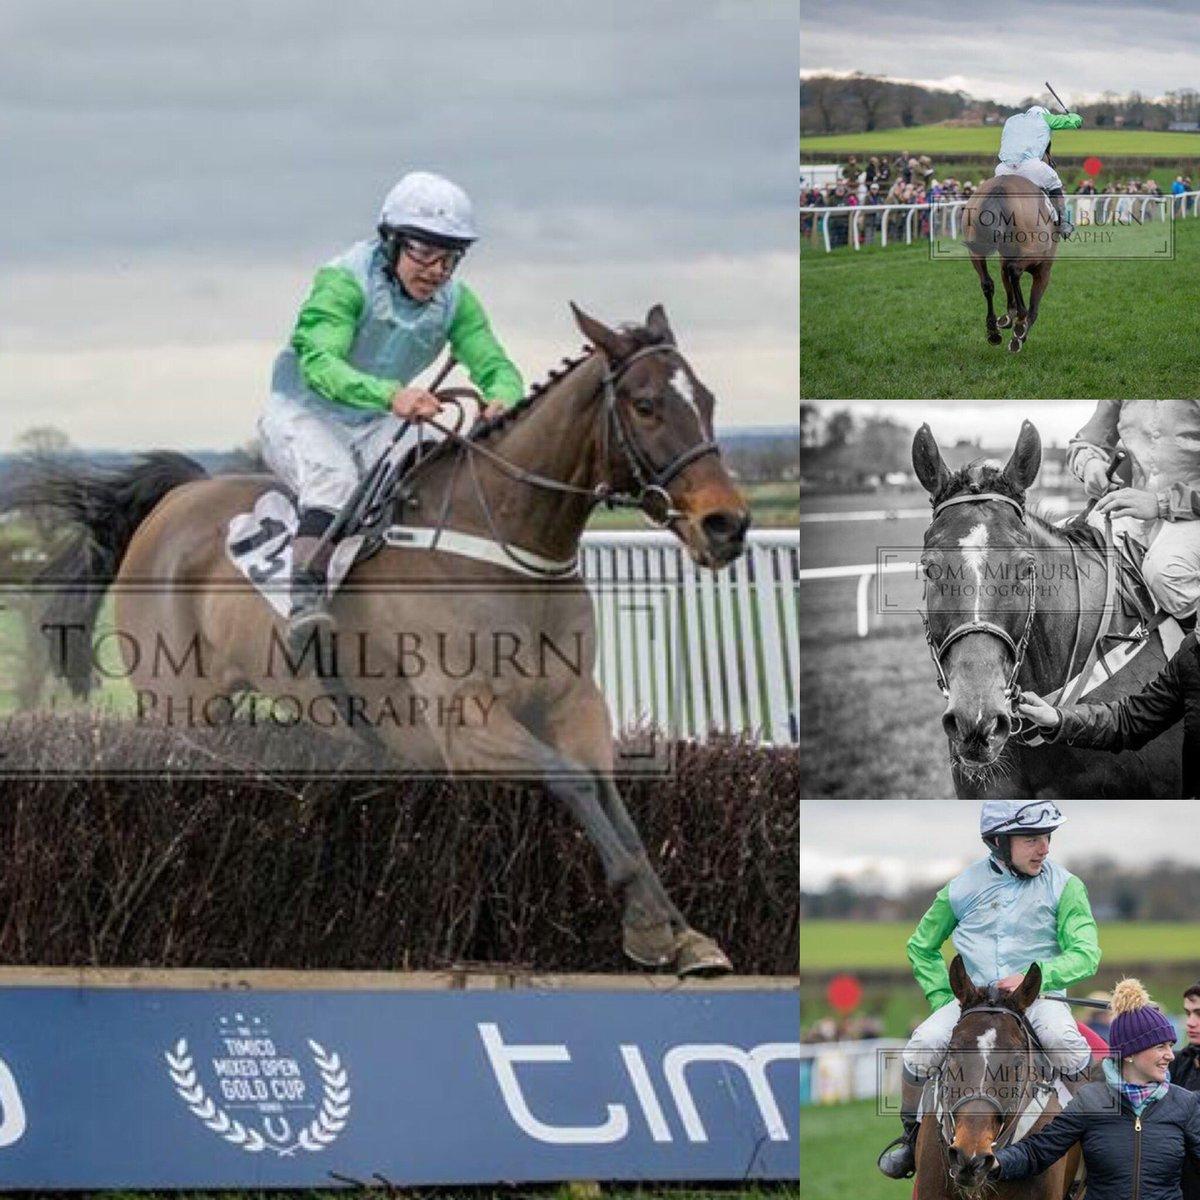 Few pics of Pete's win yesterday, very stylish (pics courtesy of Tom Milburn Photography)